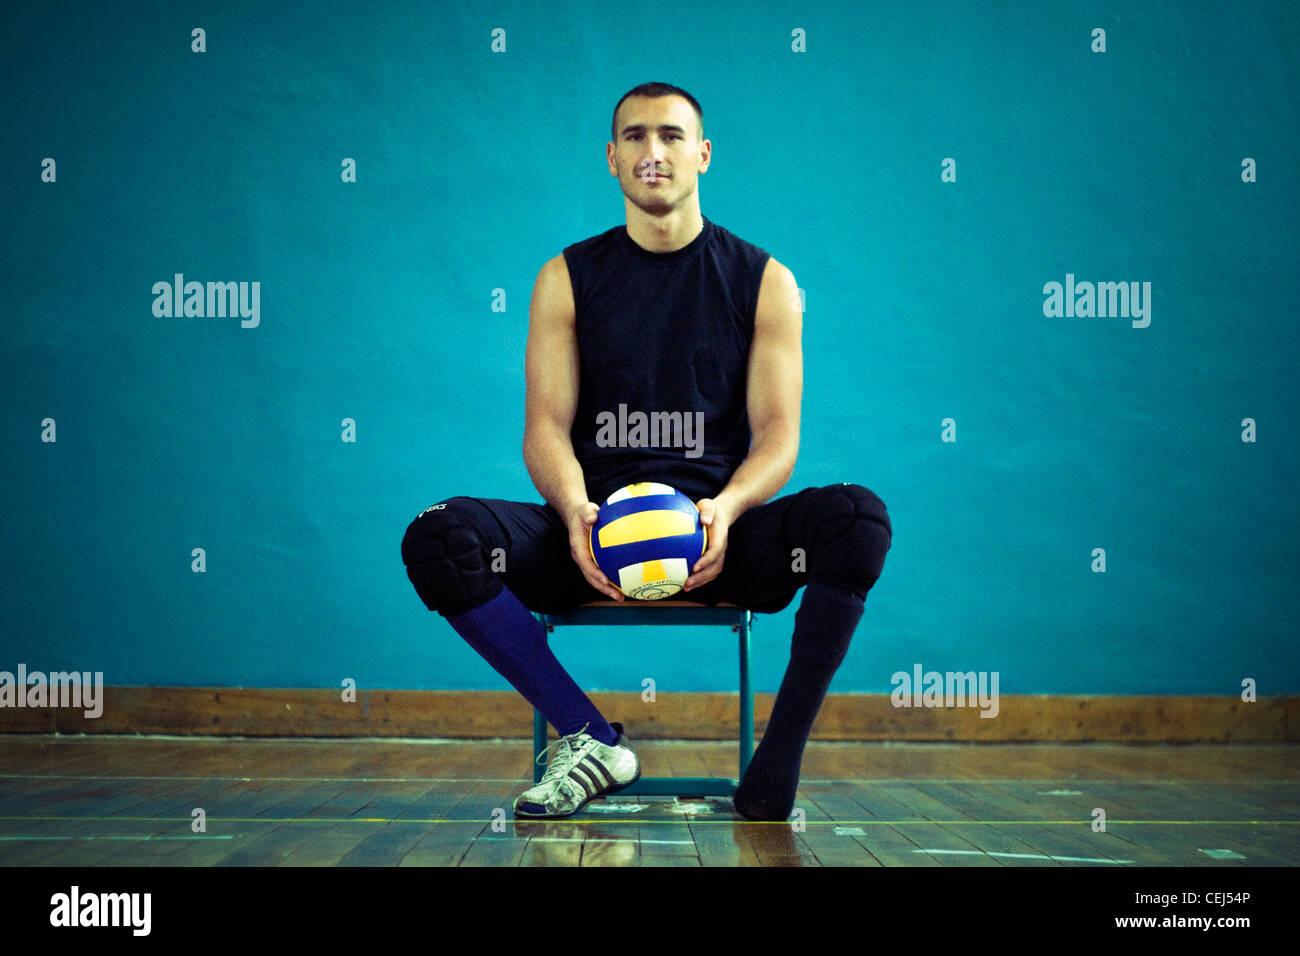 Color art fojnica - Mirzet Duran A Member Of Bosnian Sitting Volleyball Team Fojnica Bosnia And Herzegovina